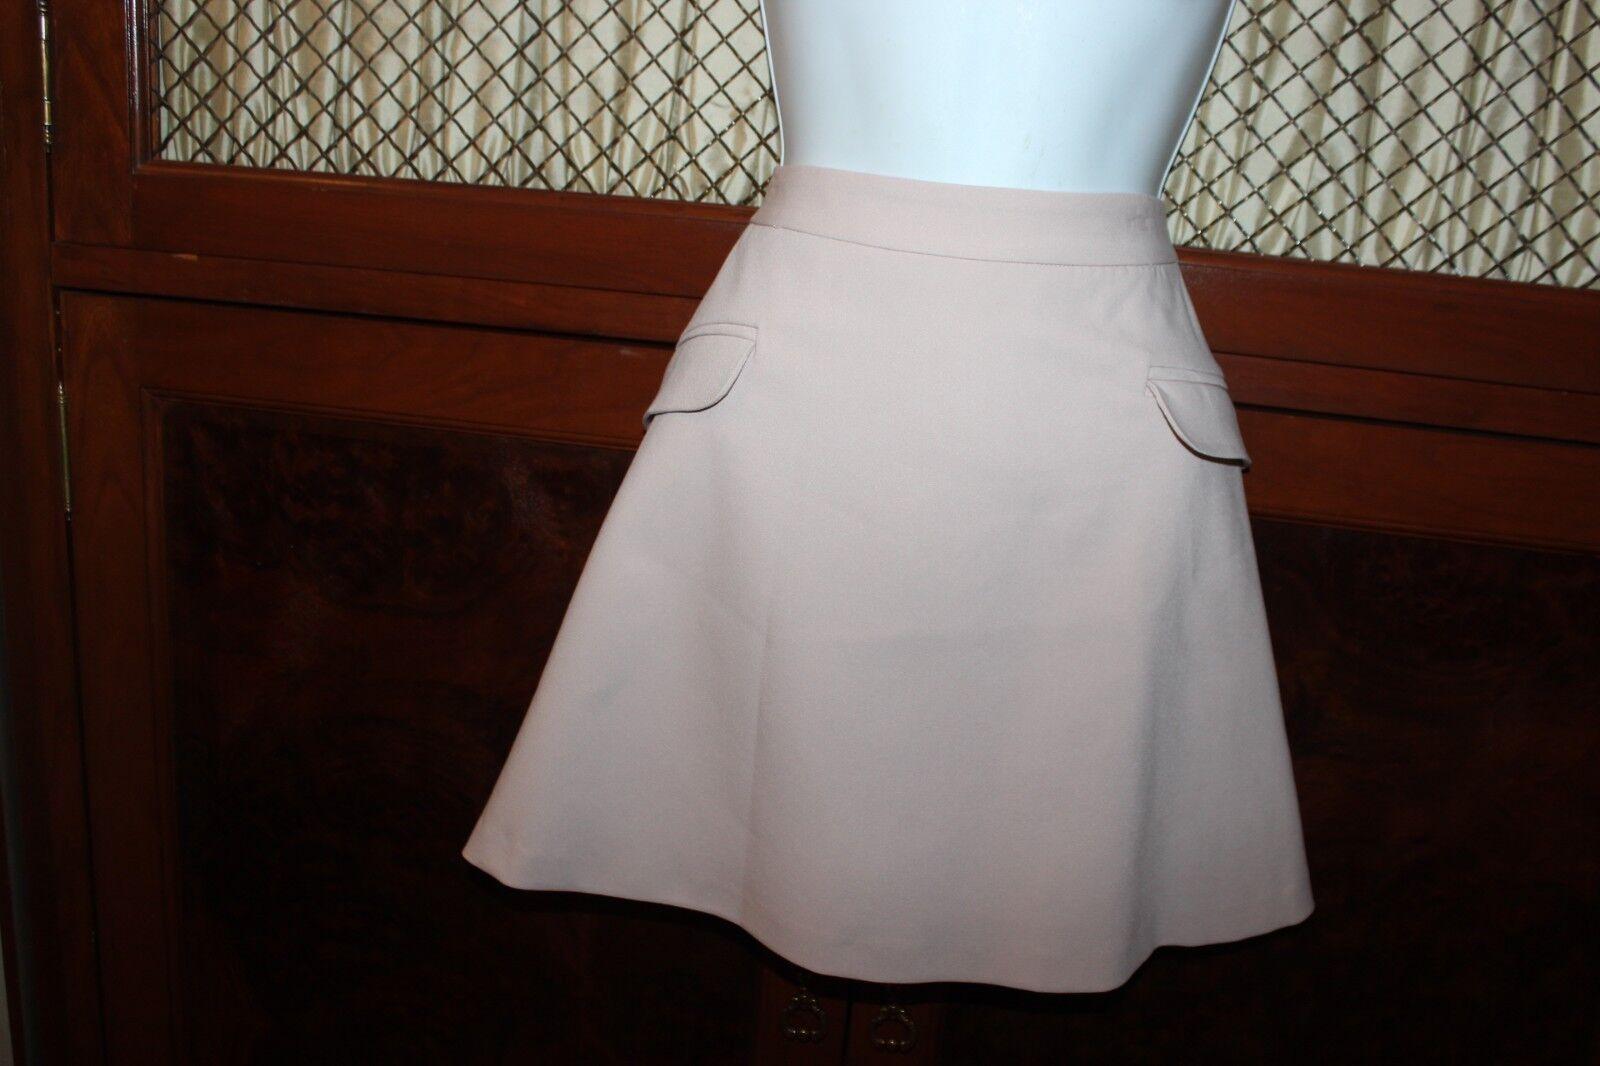 0249de012ad Alice + olivia Alice   skirt Size 2 bluesh color Olivia oqzamb7098-Skirts